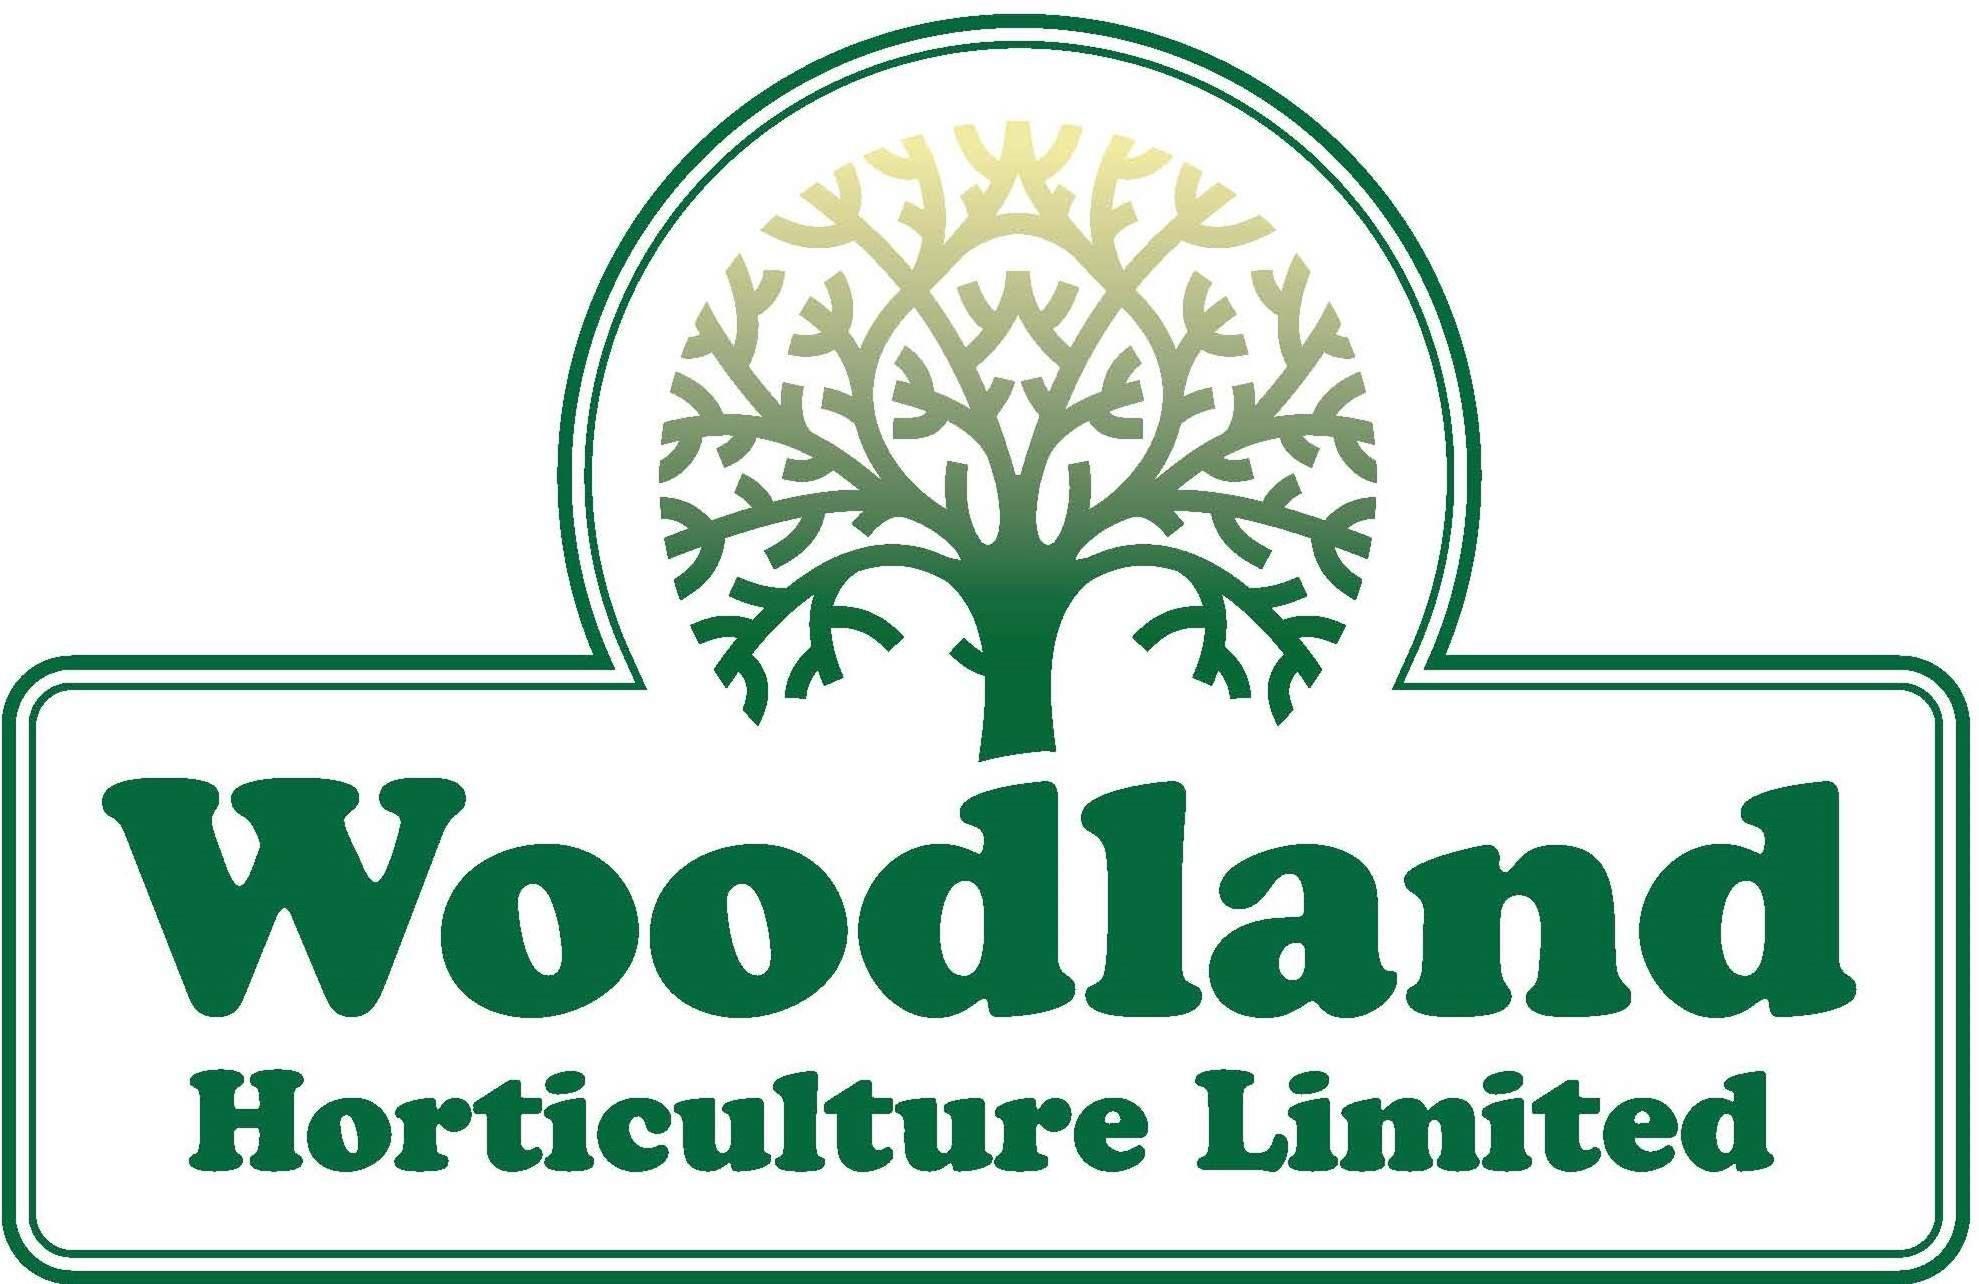 Woodland Horticulture Ltd